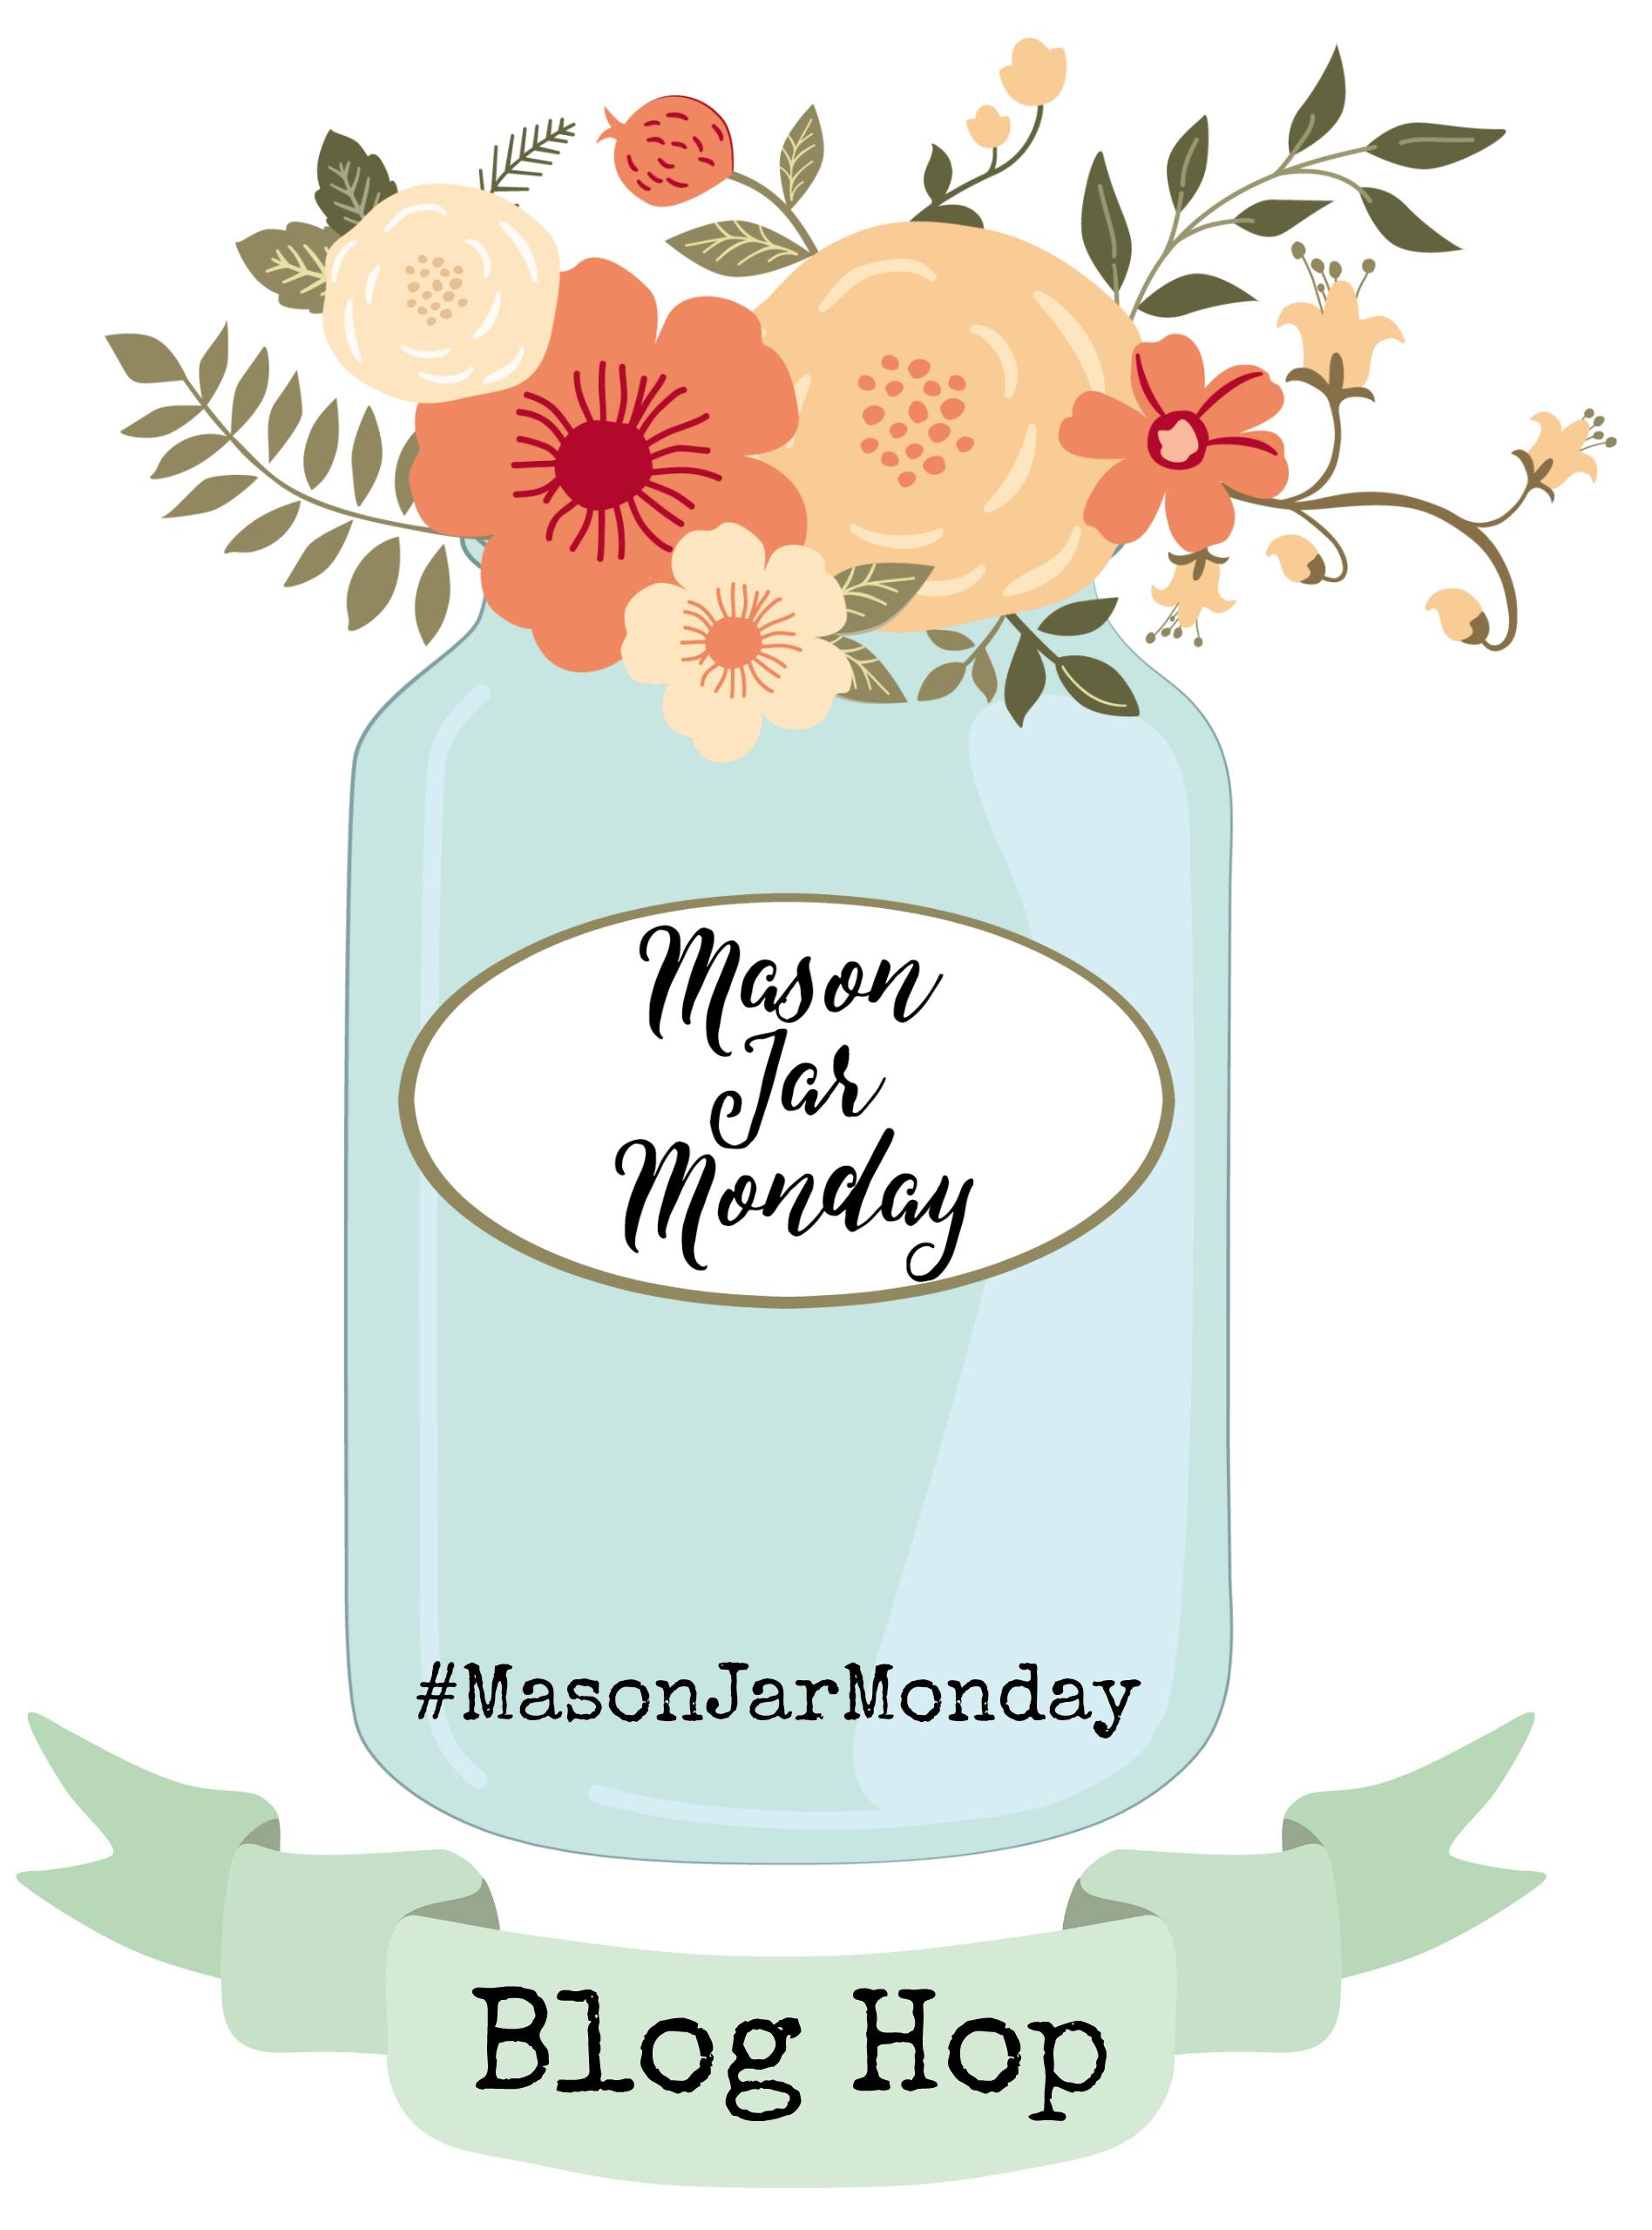 Mason Jar Monday Blog Hop #MasonJarMonday